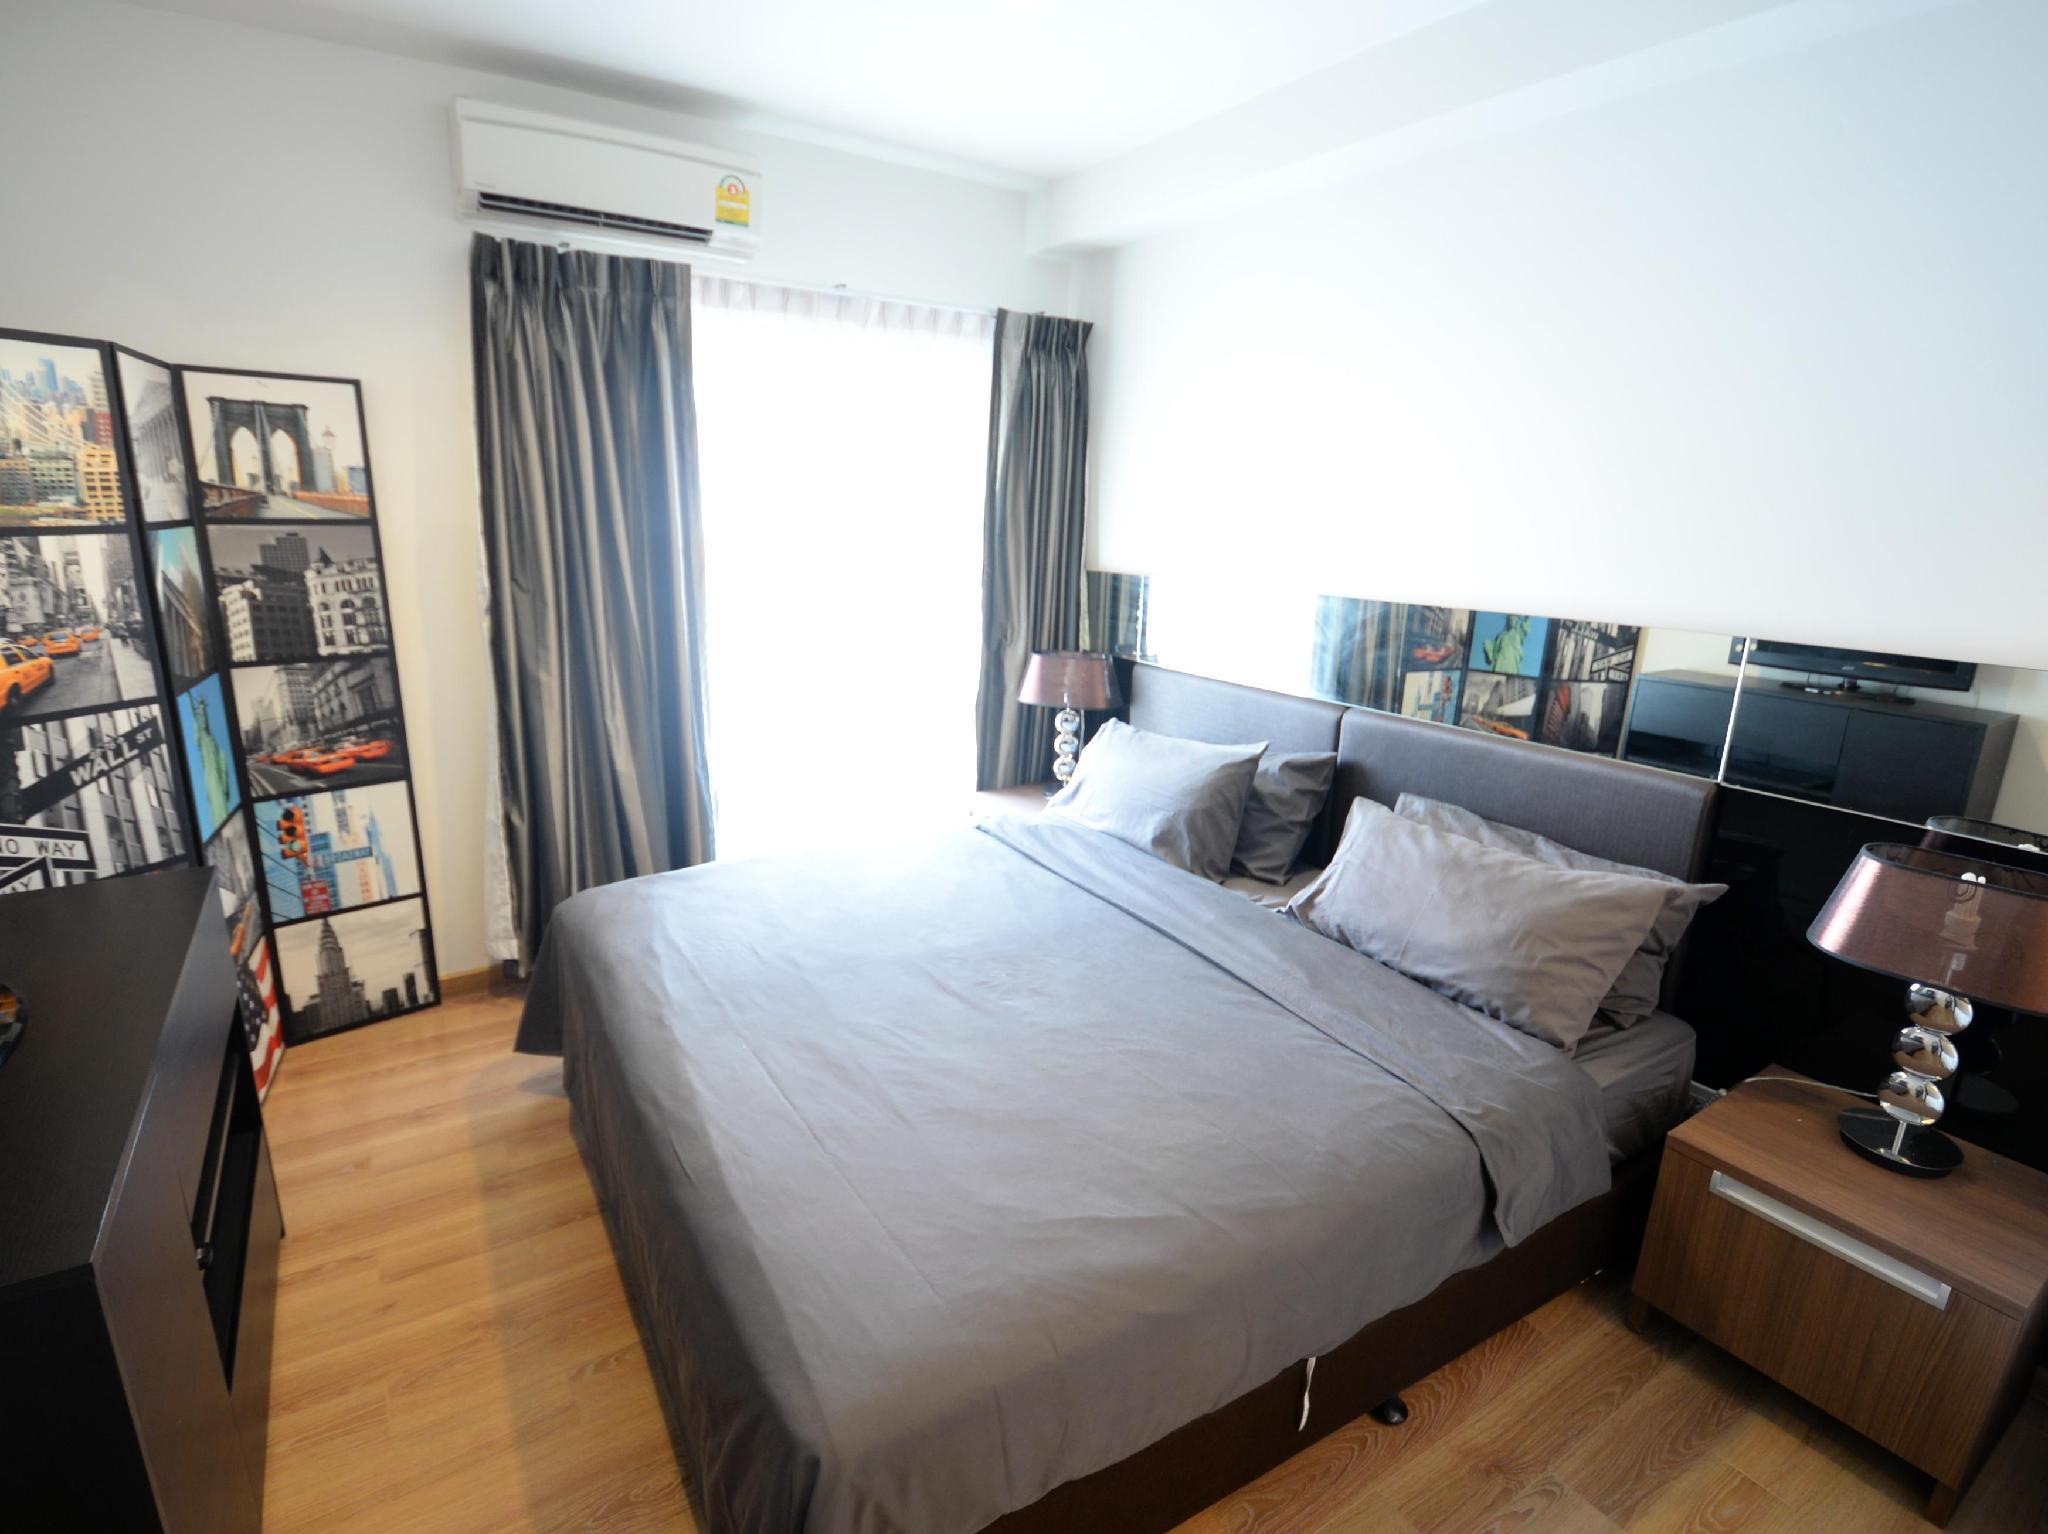 1 Bedroom Suite at National Stadium BTS Station,1 เบดรูมสวีท แอท เนชั่นแนลสเตเดียม บีทีเอสสเตชั่น